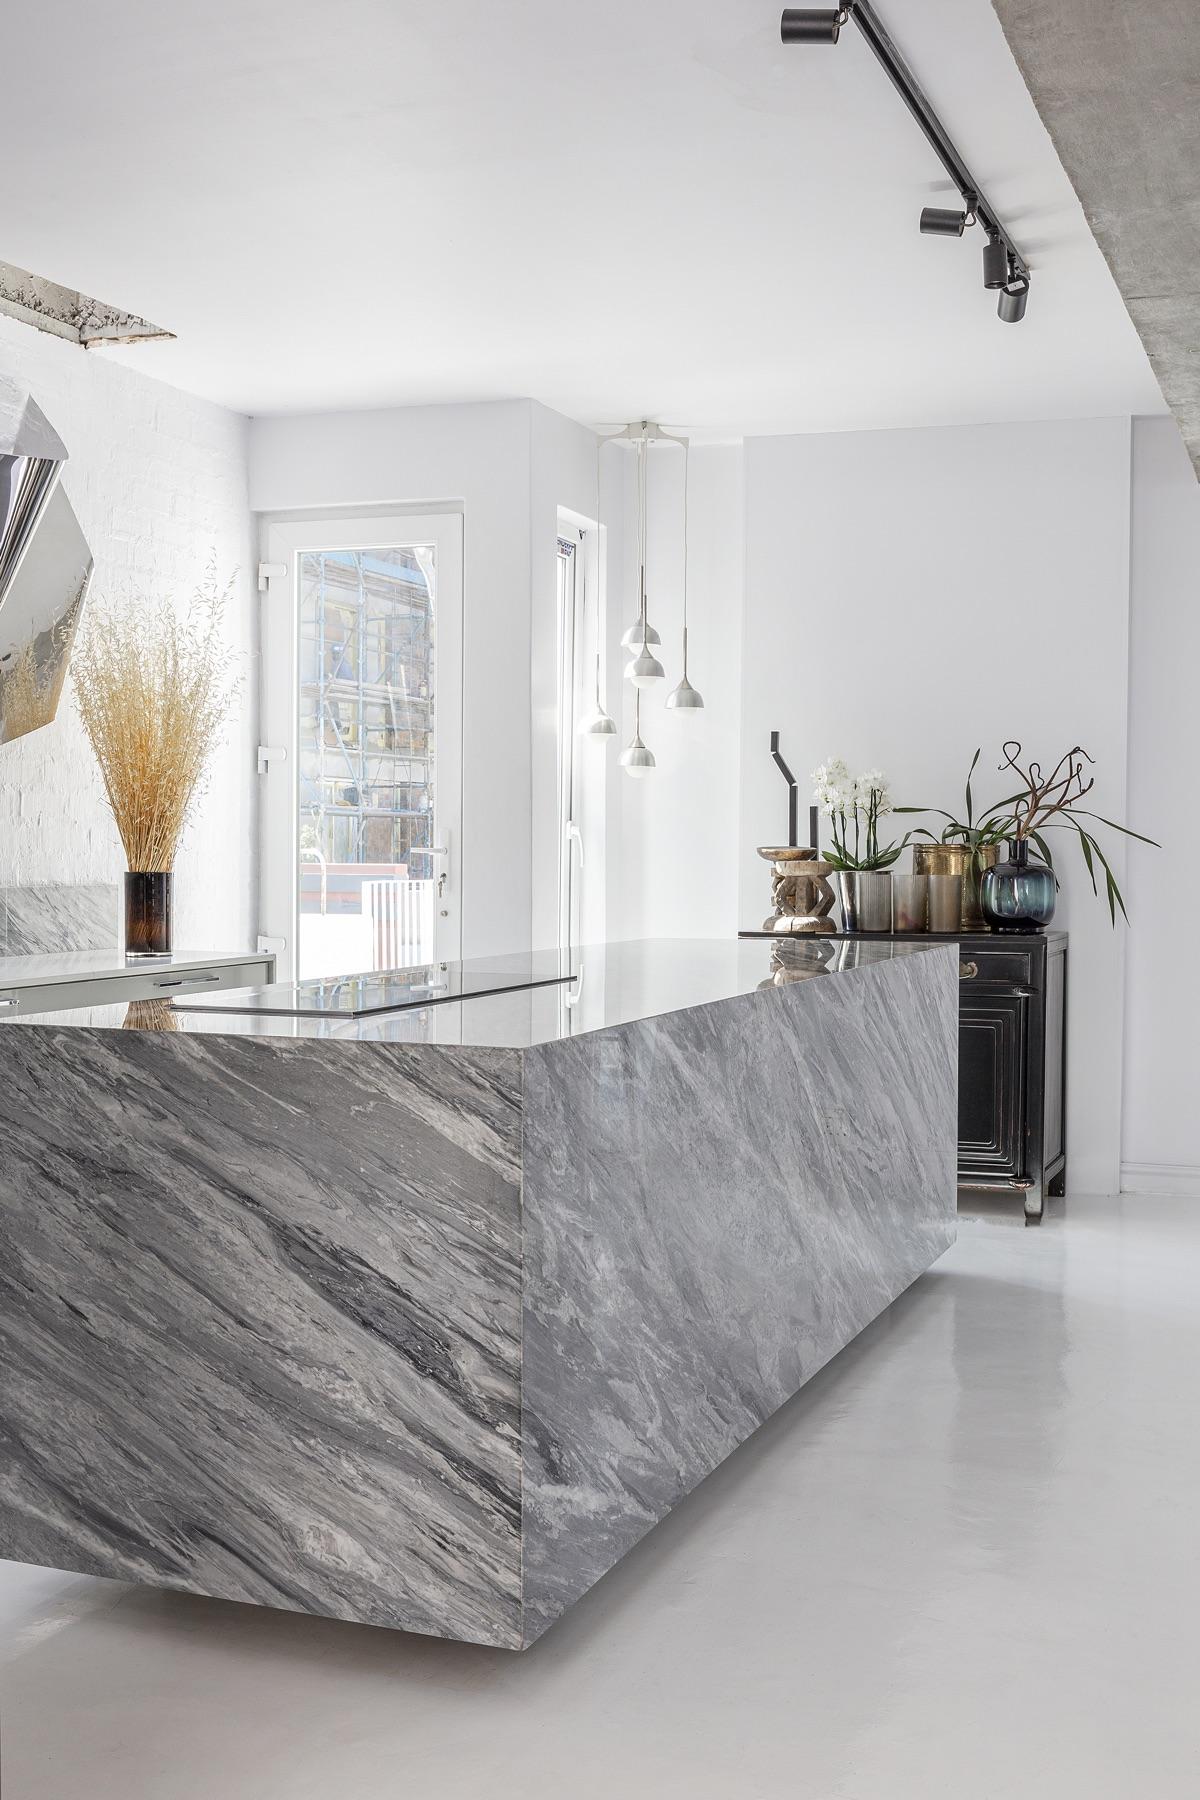 Artmar-Natural-Stone-Kitchen-Countertops00003.jpg